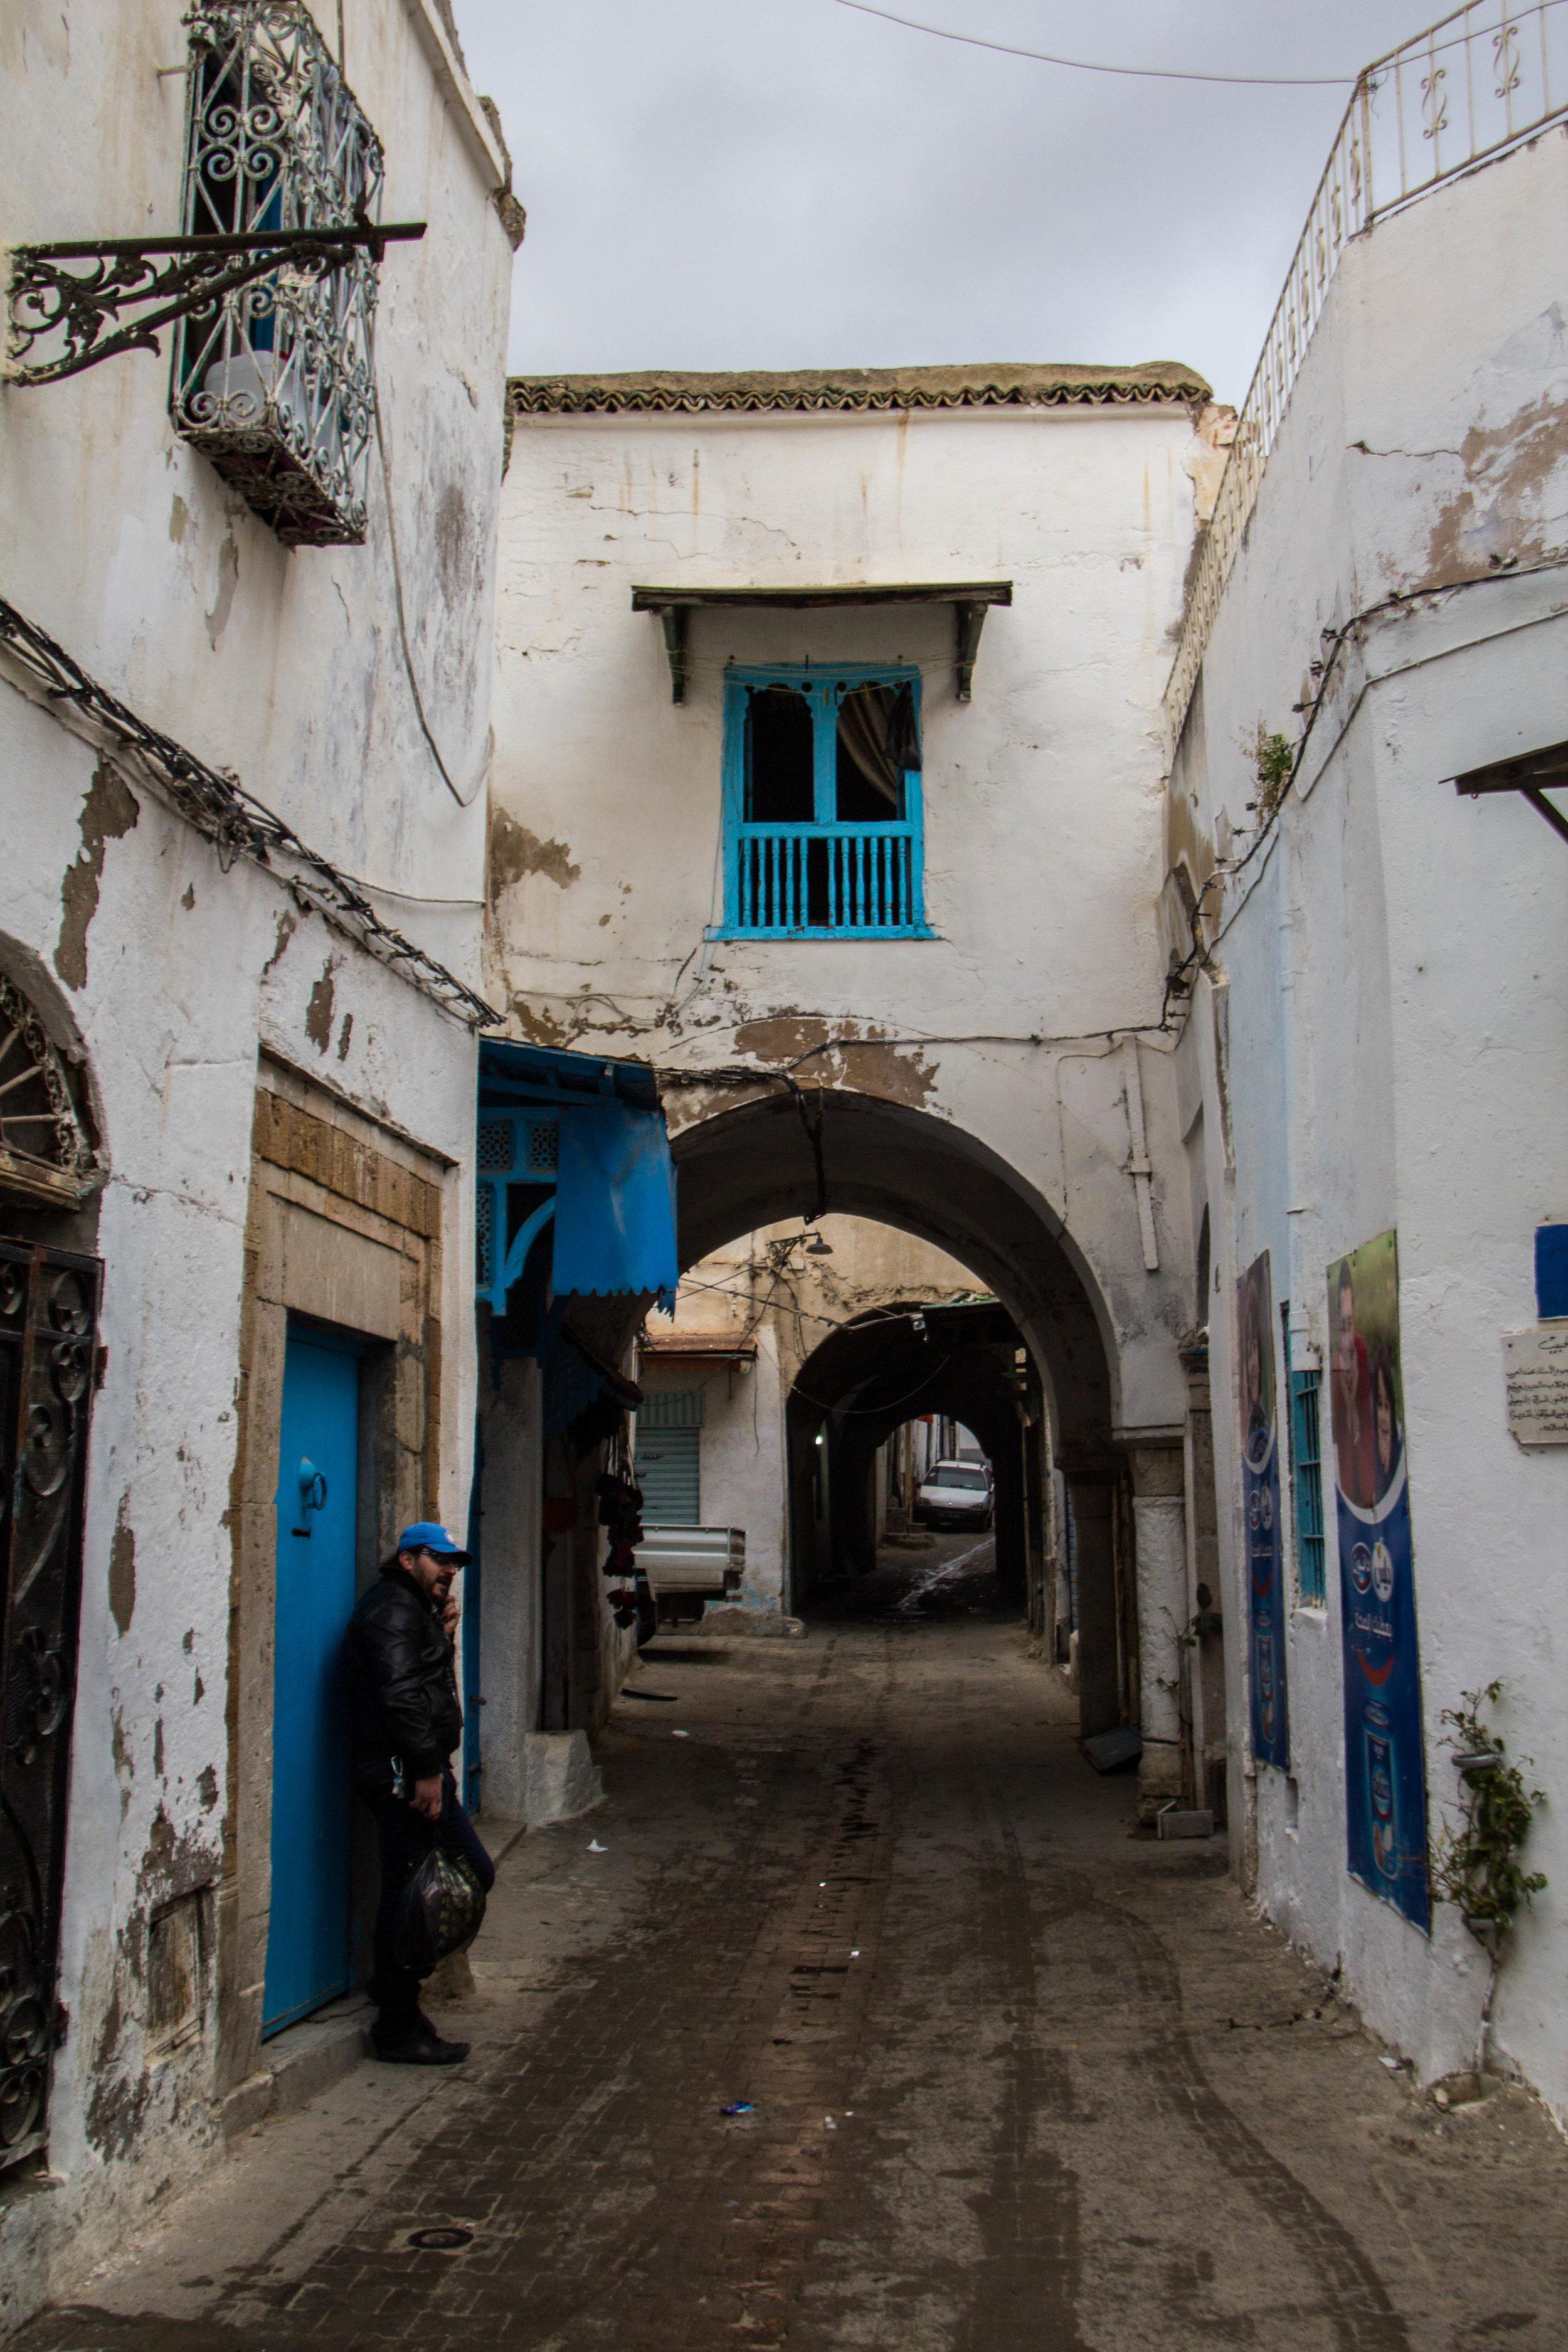 medina-photography-tunis-tunisia-52.jpg